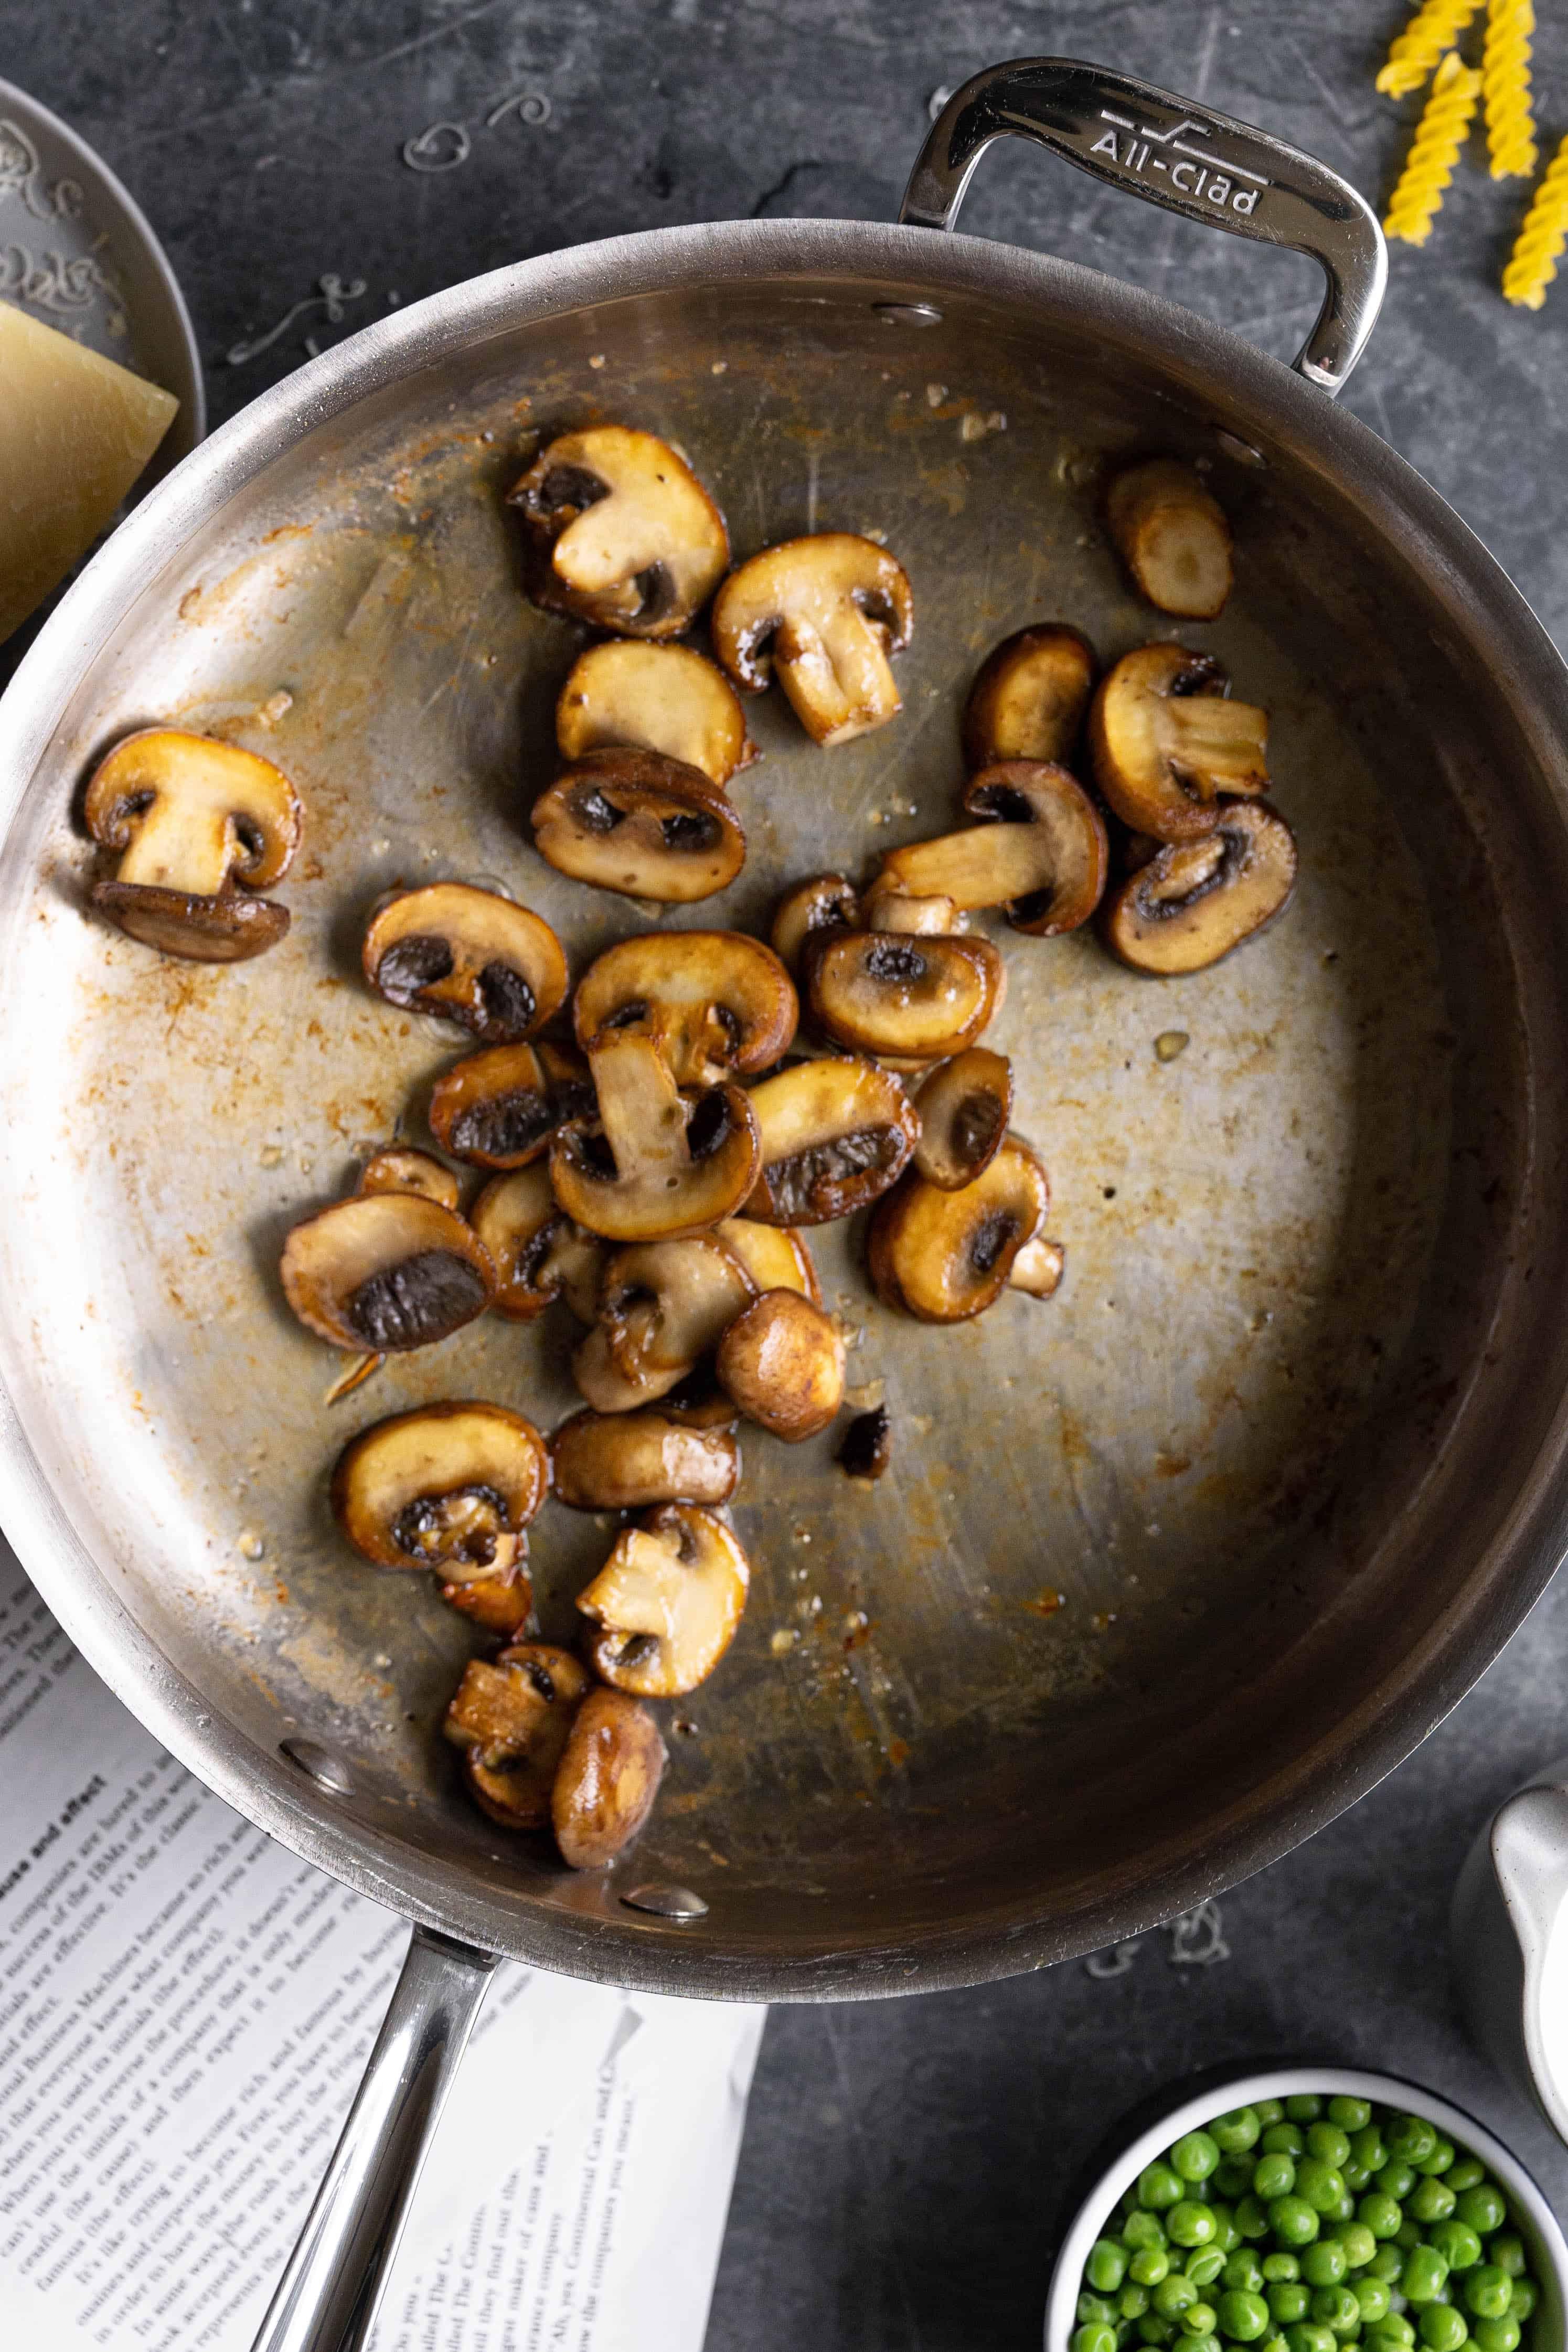 A pan with mushrooms